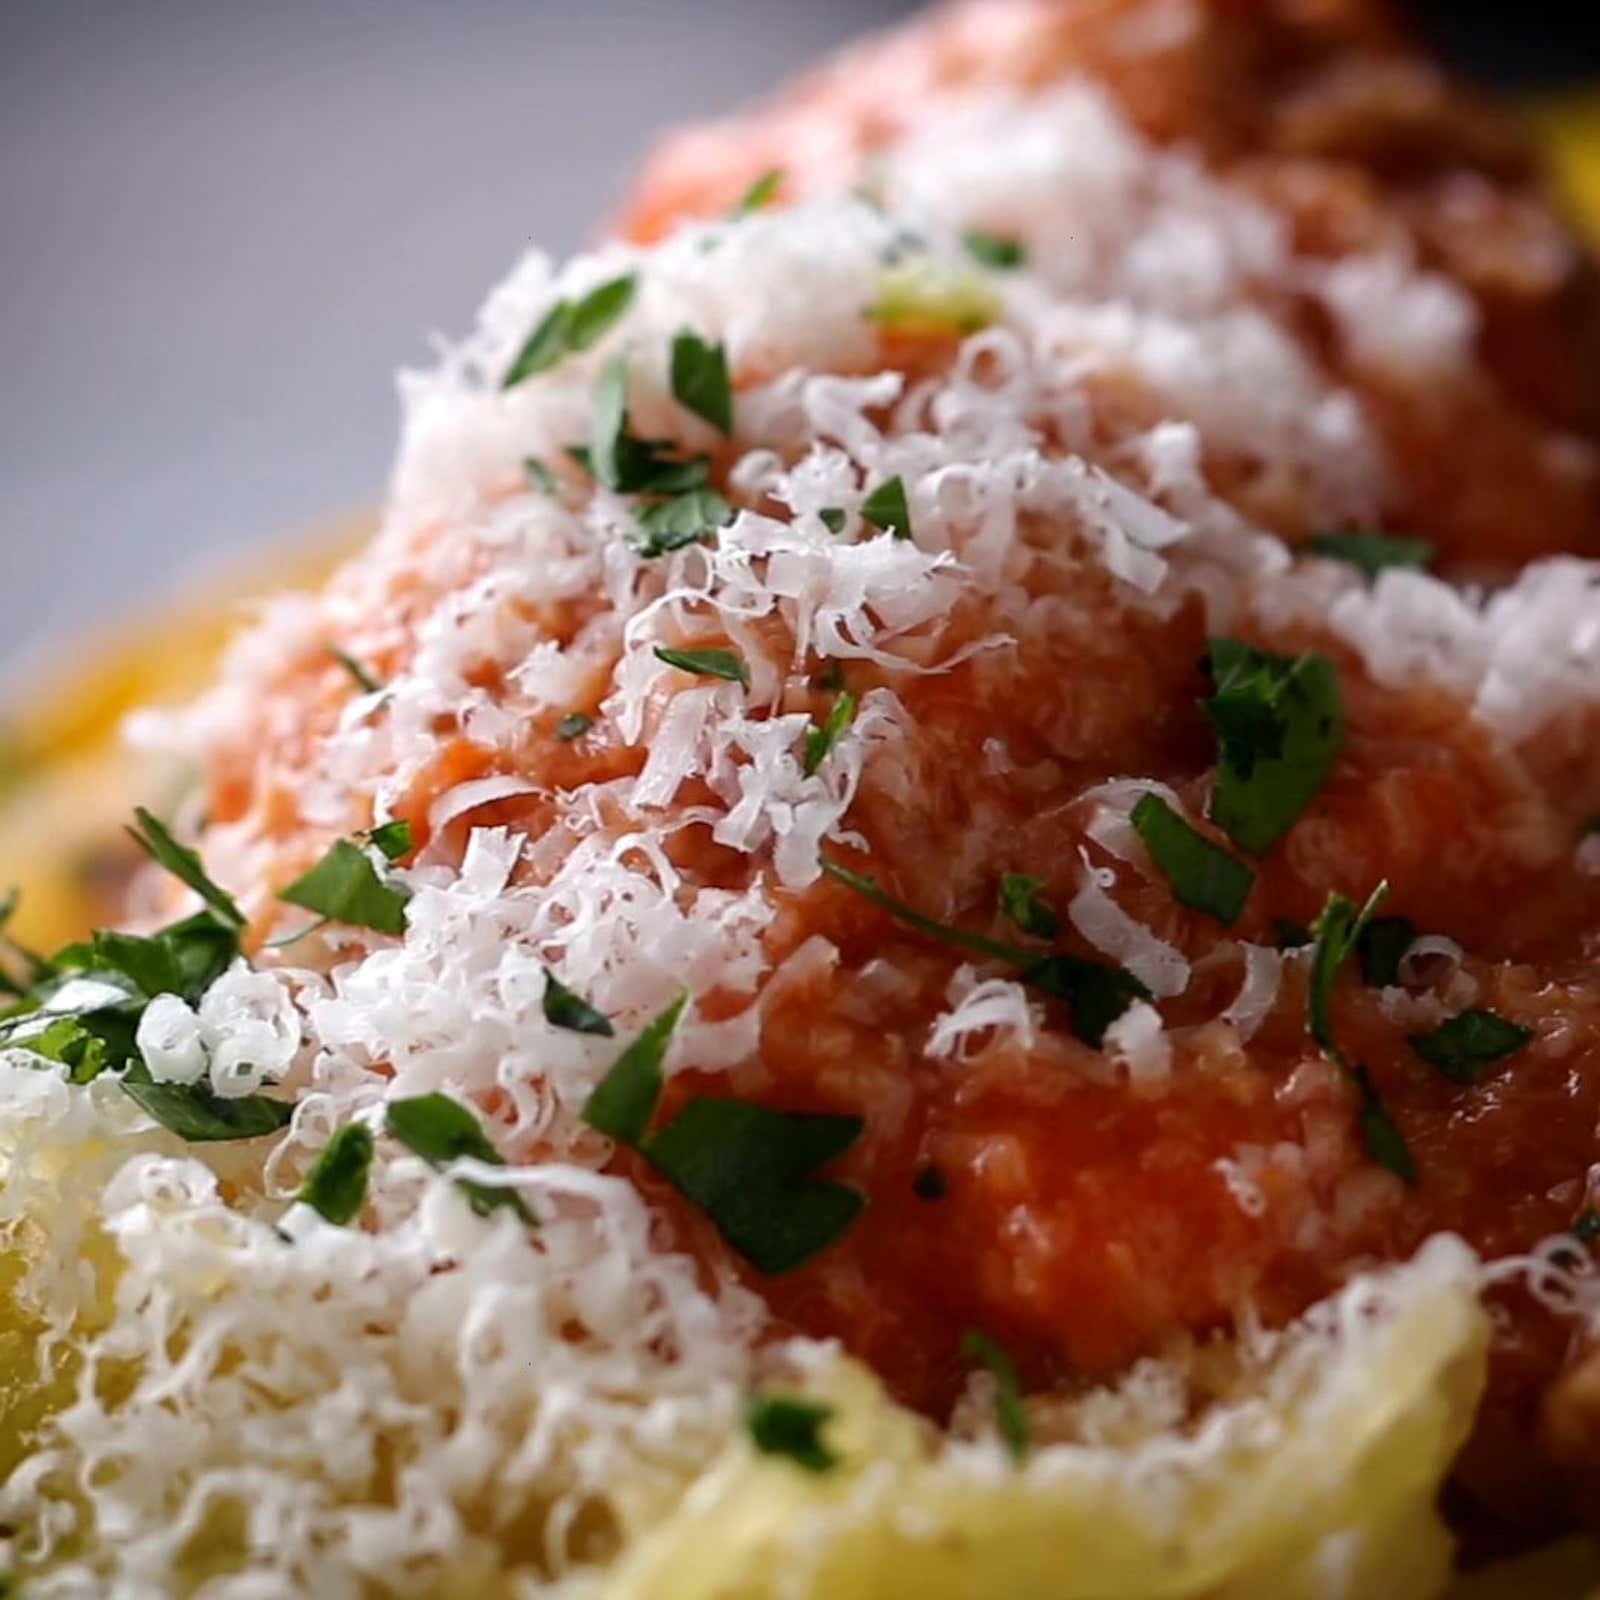 Microwave Spaghetti Squash & Meatballs